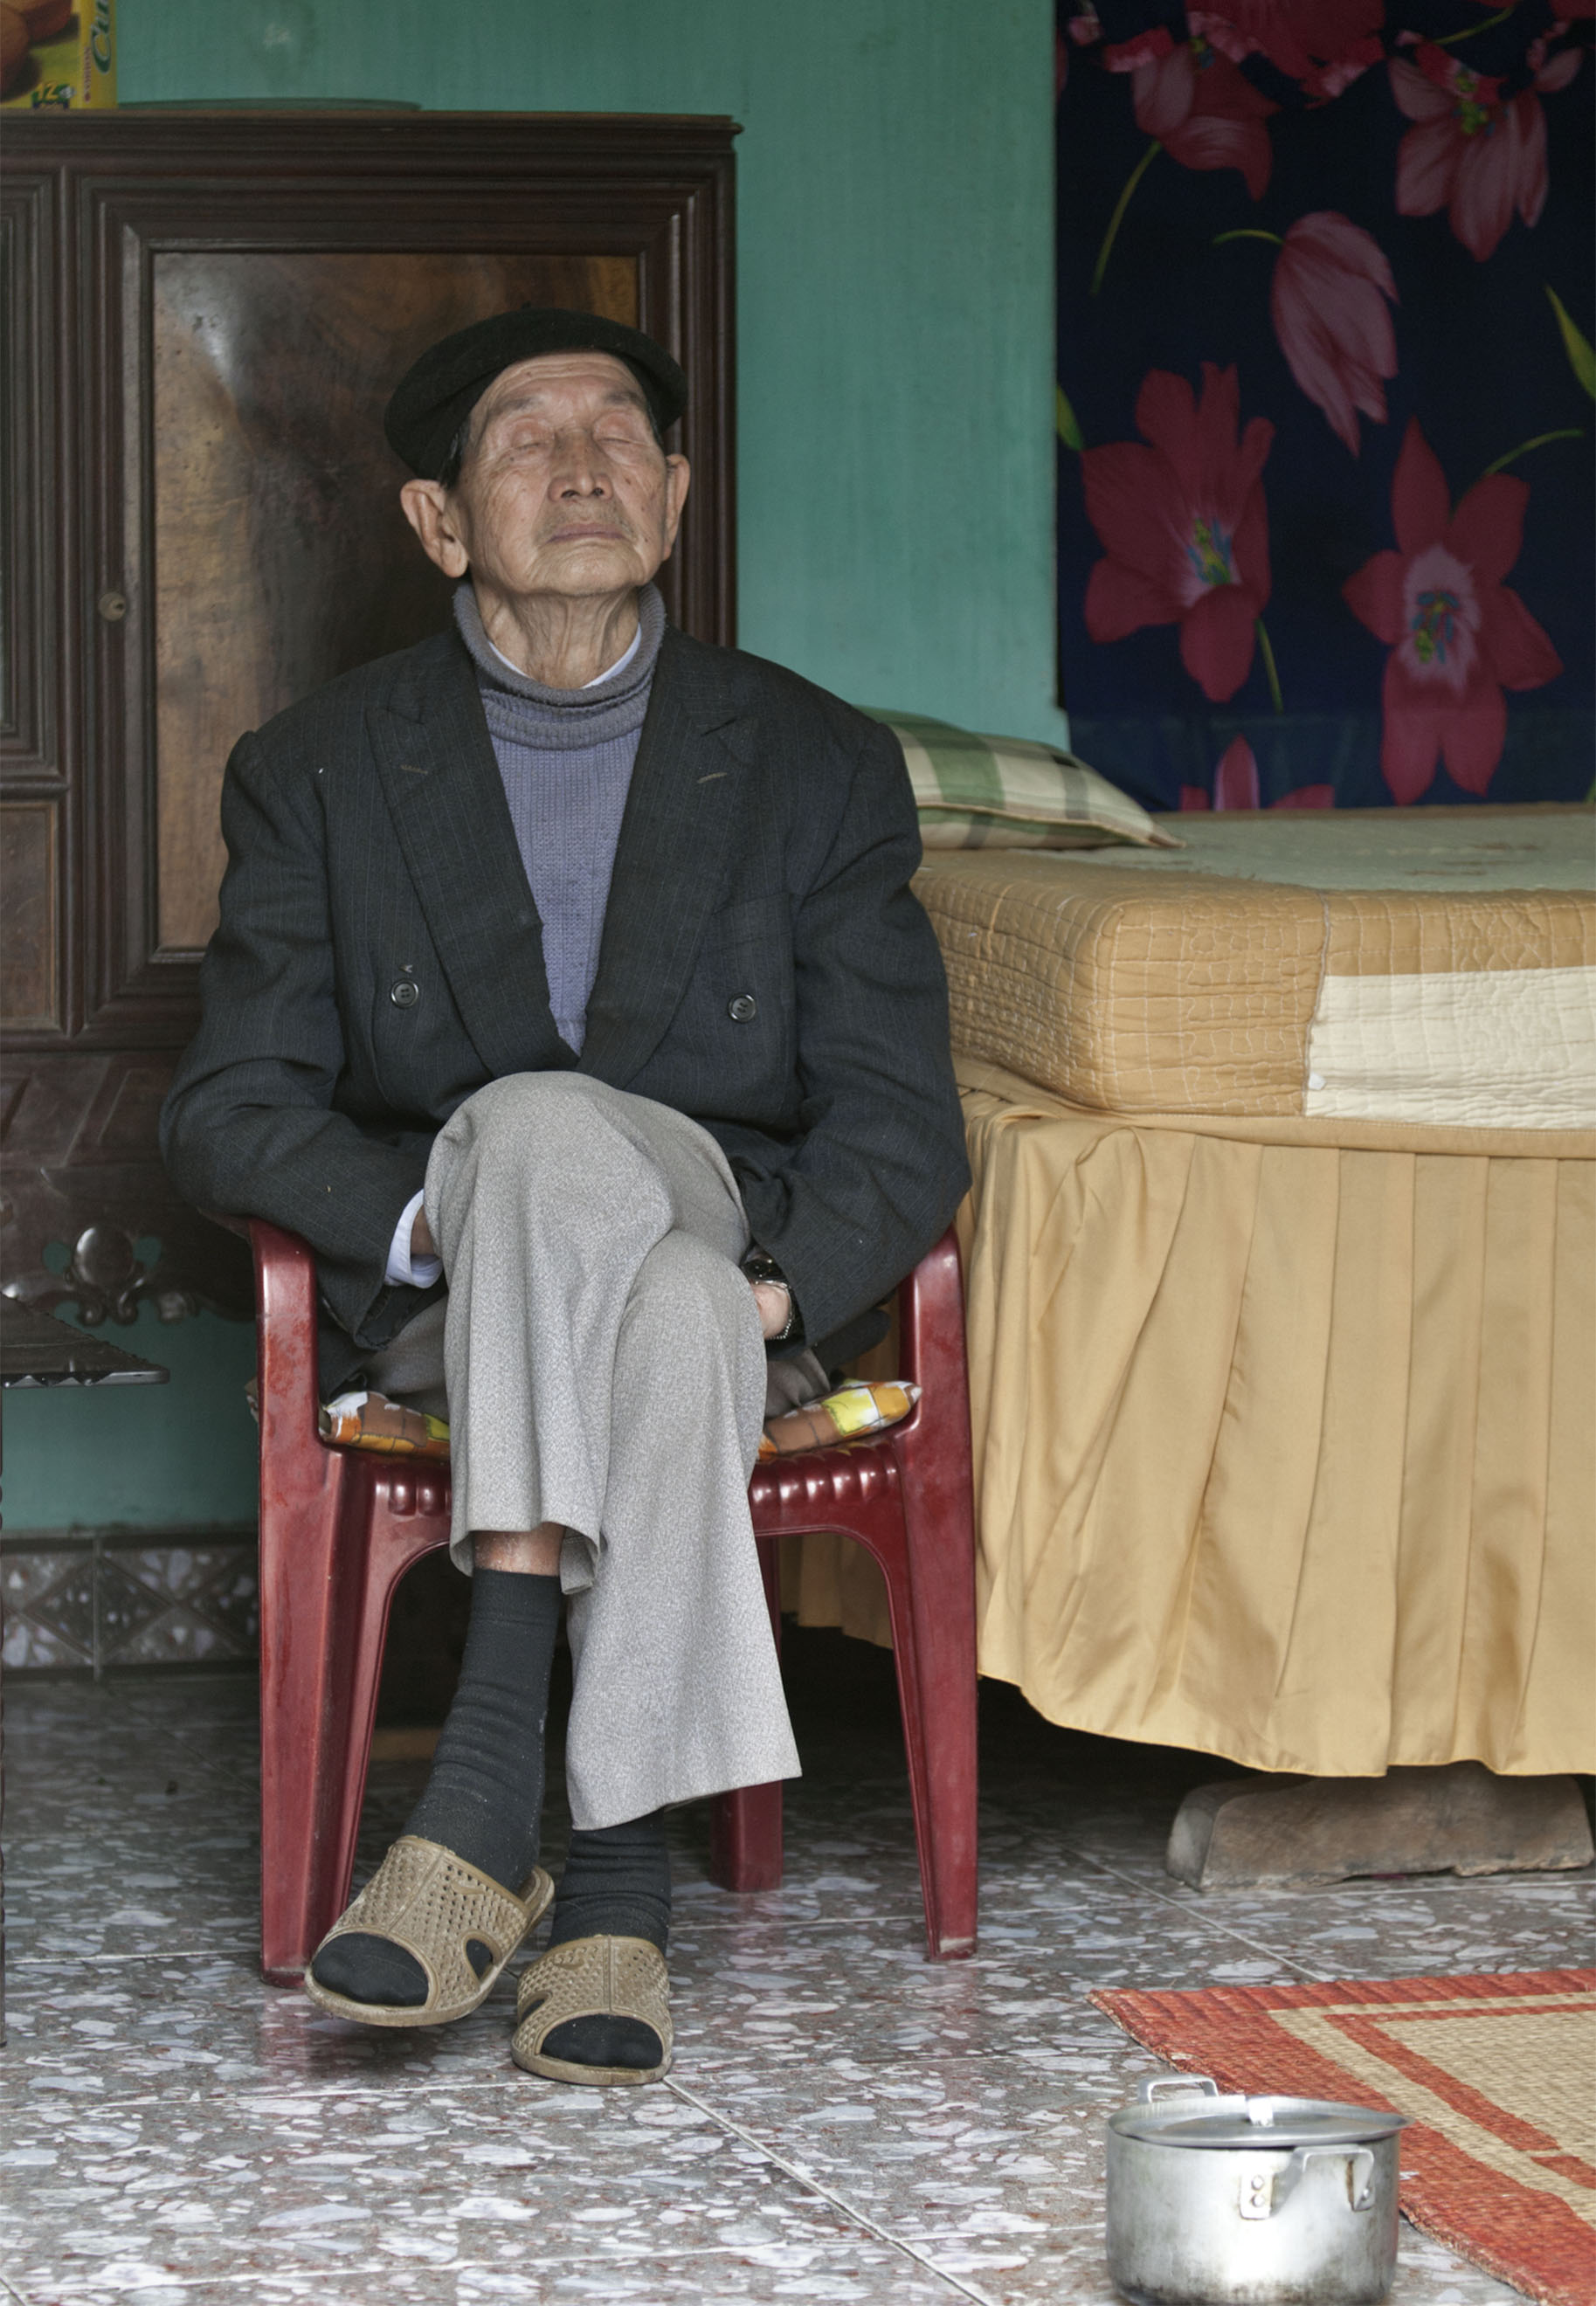 Image of Vietnam veteran